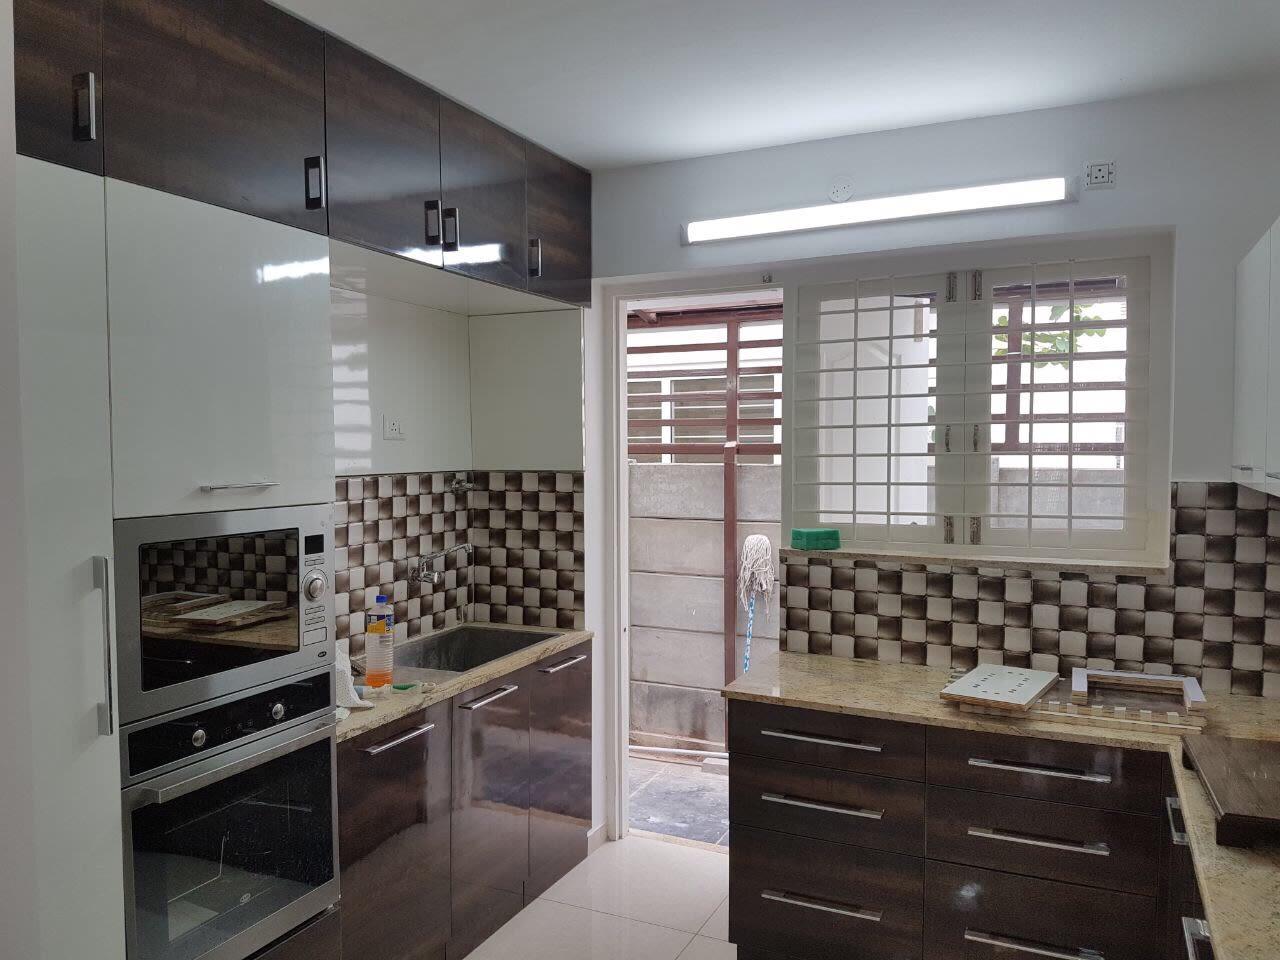 Wood Finish Modular Kitchen by Odd architecture studio  Modular-kitchen Modern | Interior Design Photos & Ideas